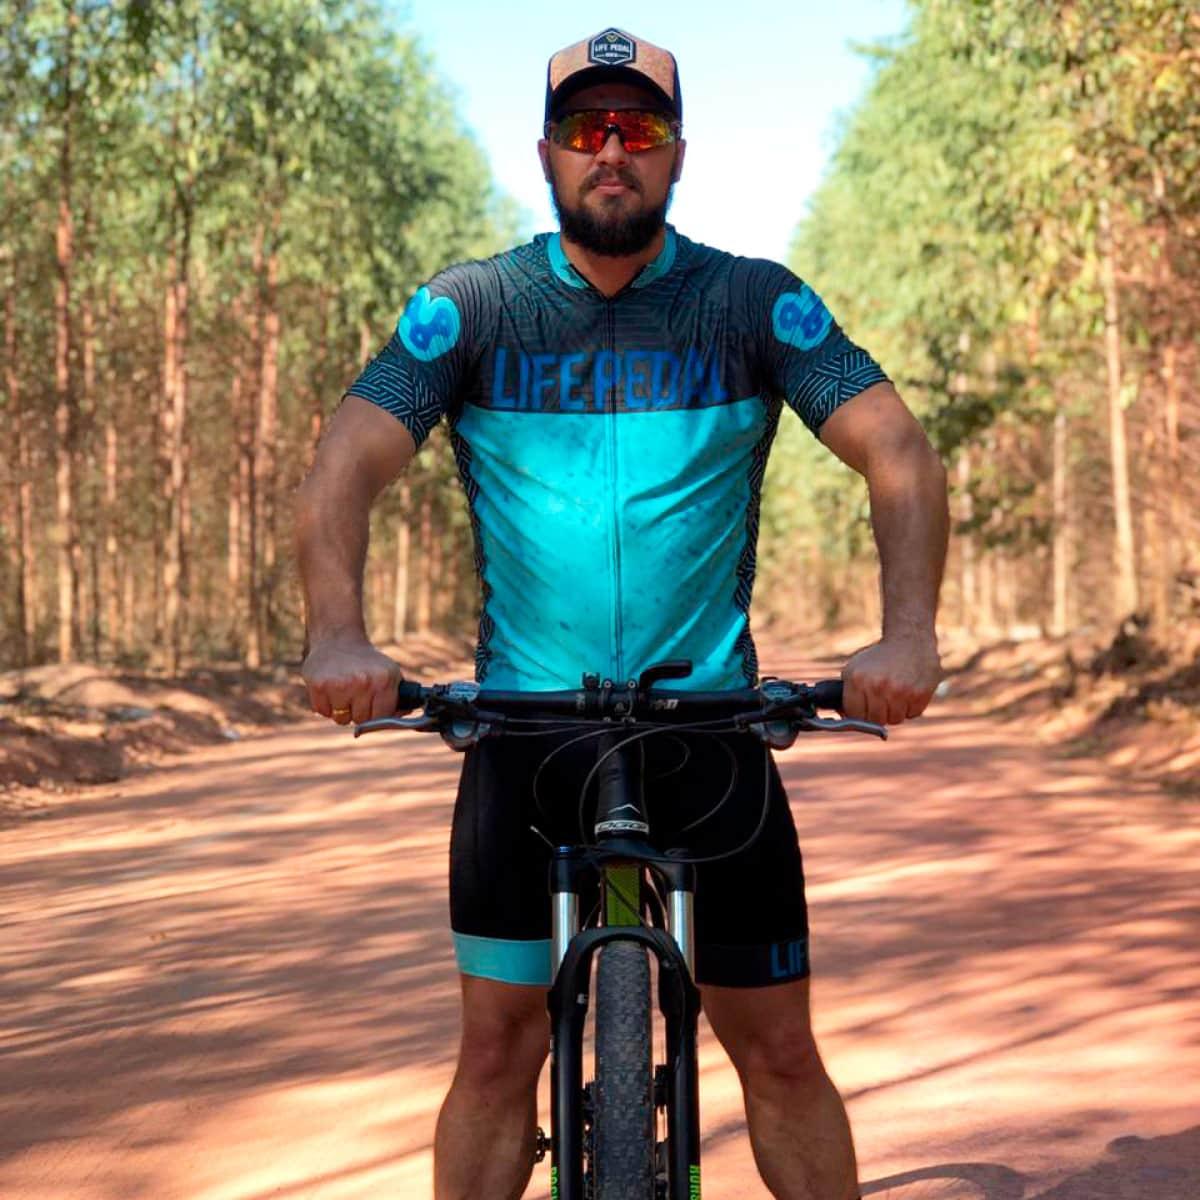 Camisa Life Pedal Masculina Normal